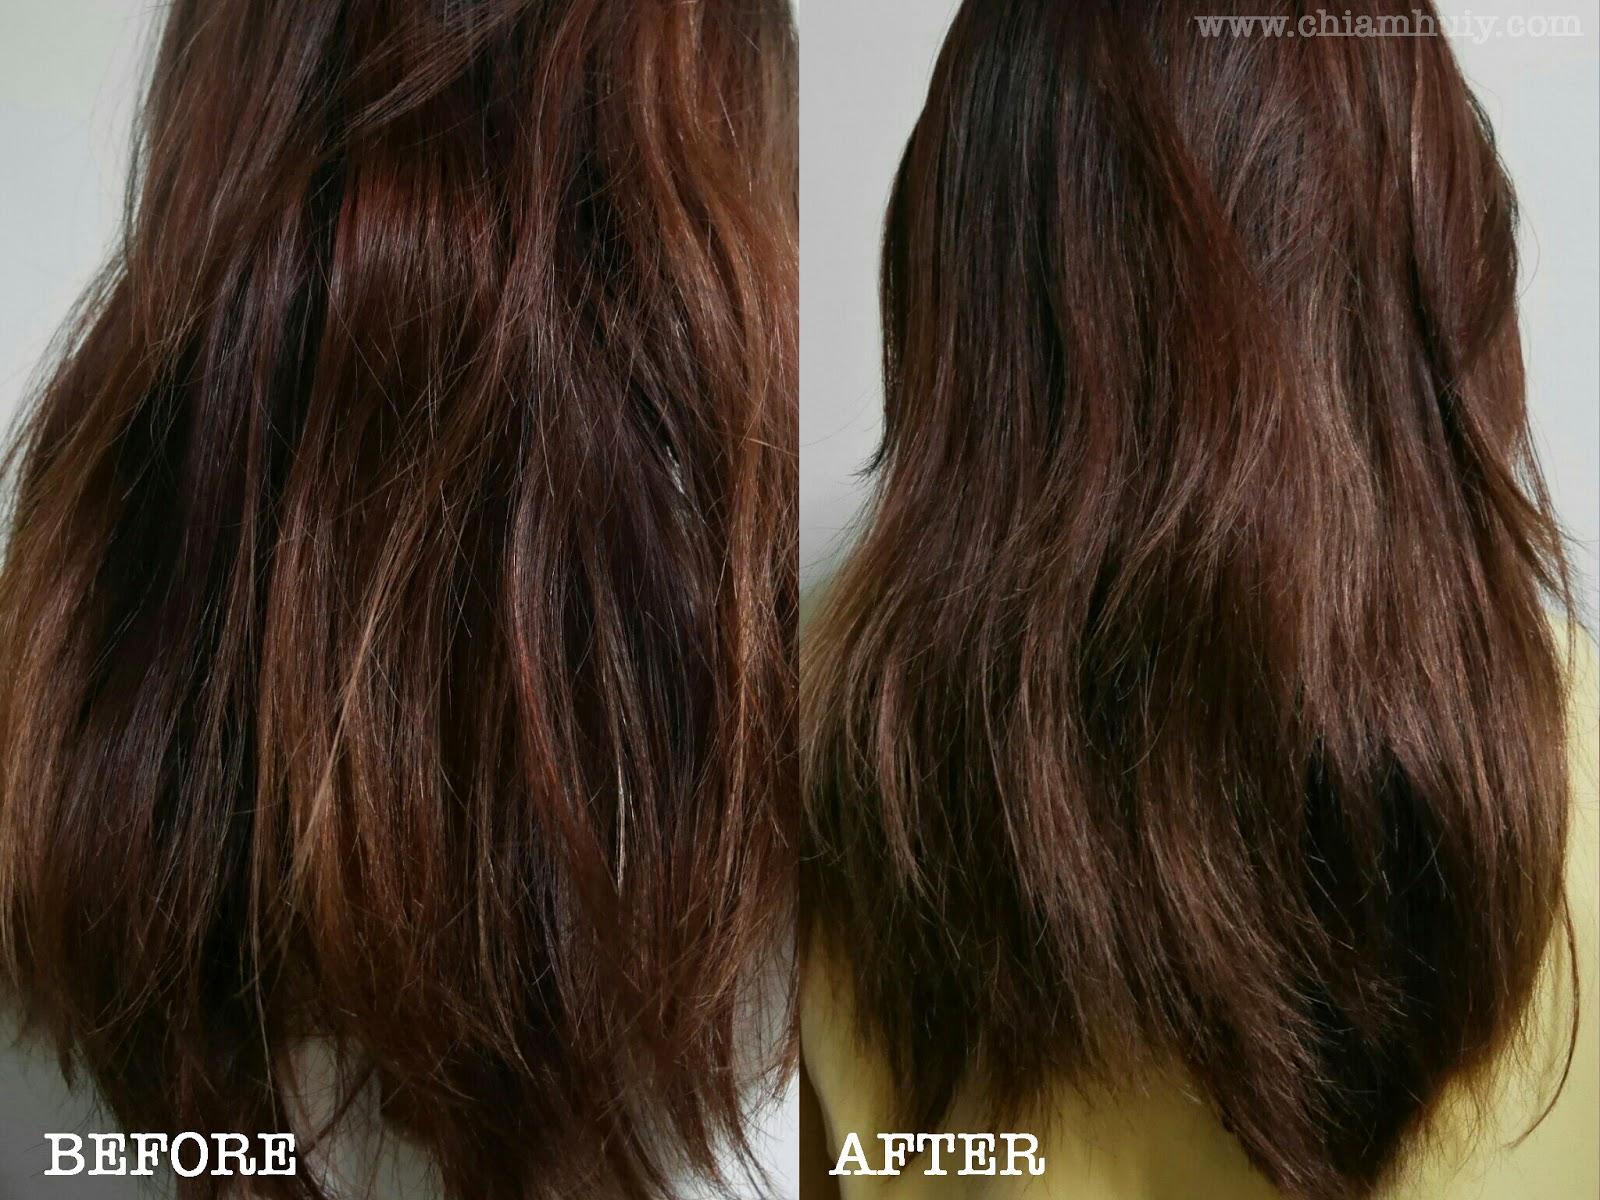 Blue dark ombre hair photo